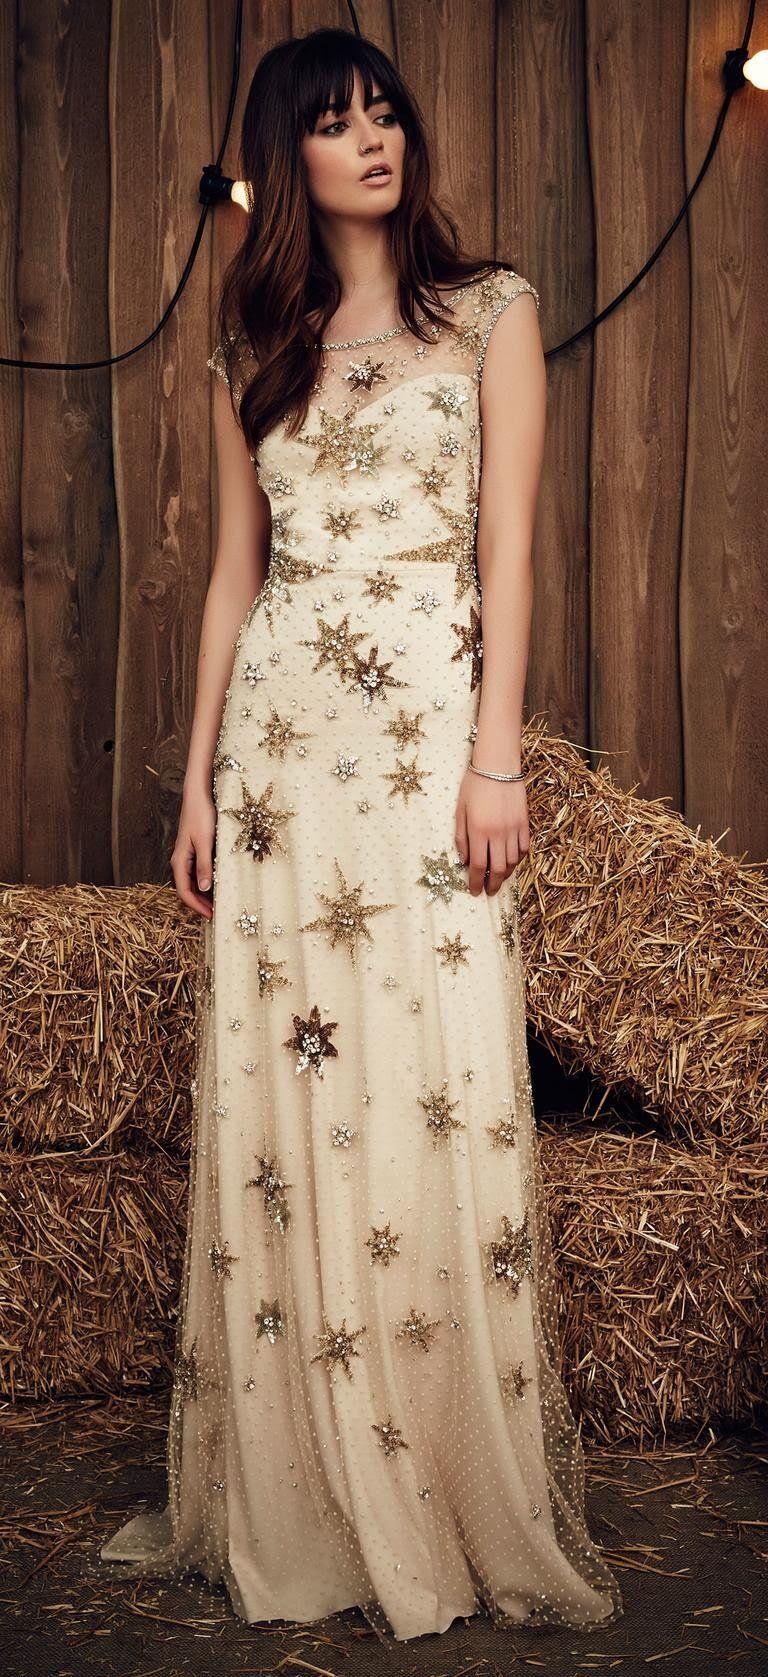 Gold white wedding dress  Celadon Green Hits the Runway at Jenny Packhamus GypsyInspired